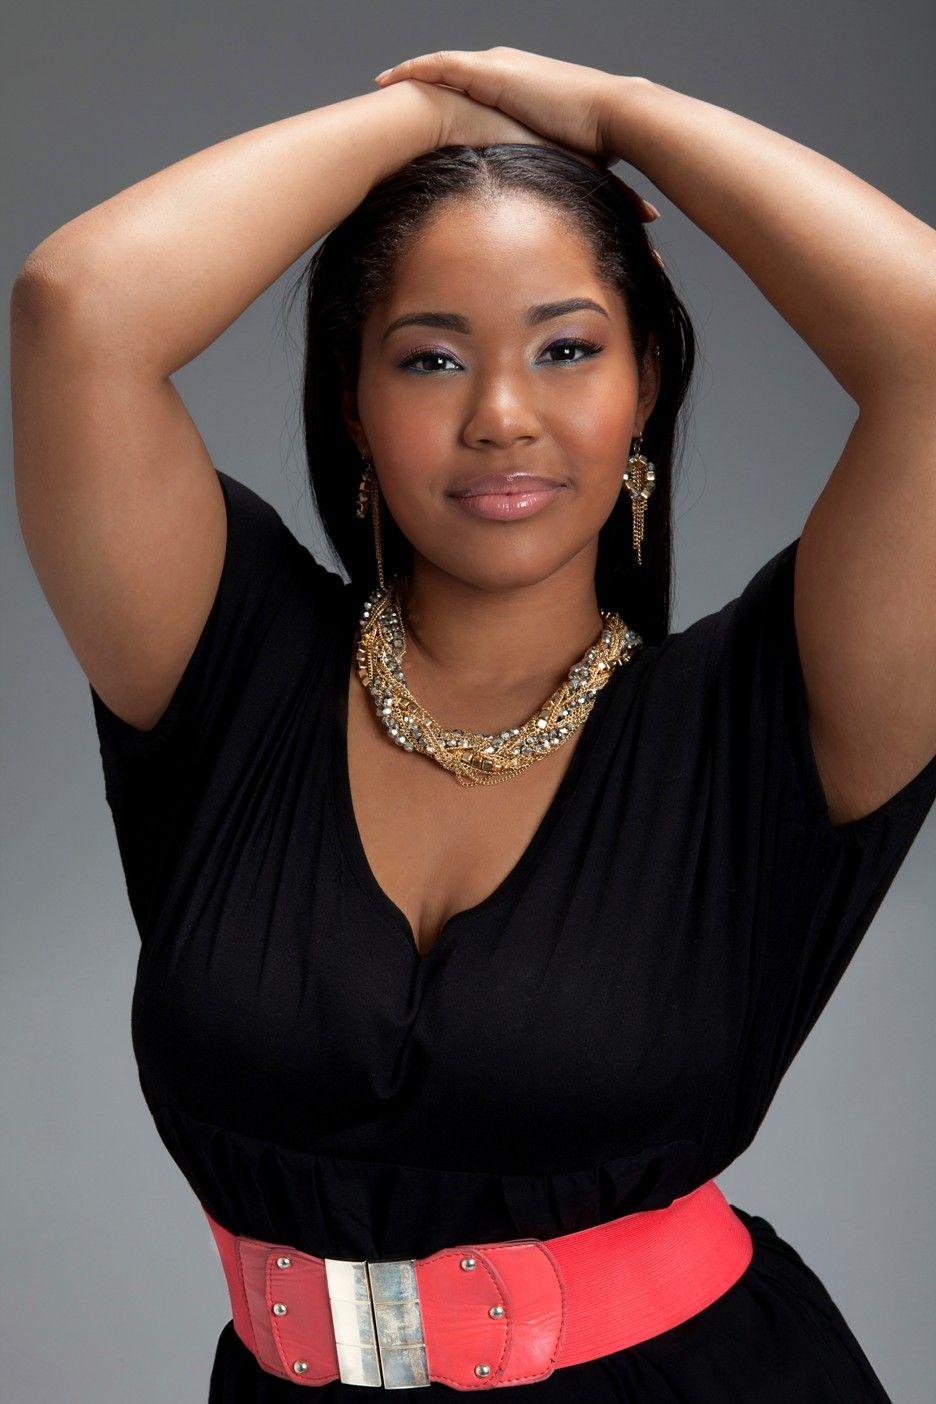 Black Plus Size Models  Lisa Raye Daughter Plus Size -5493